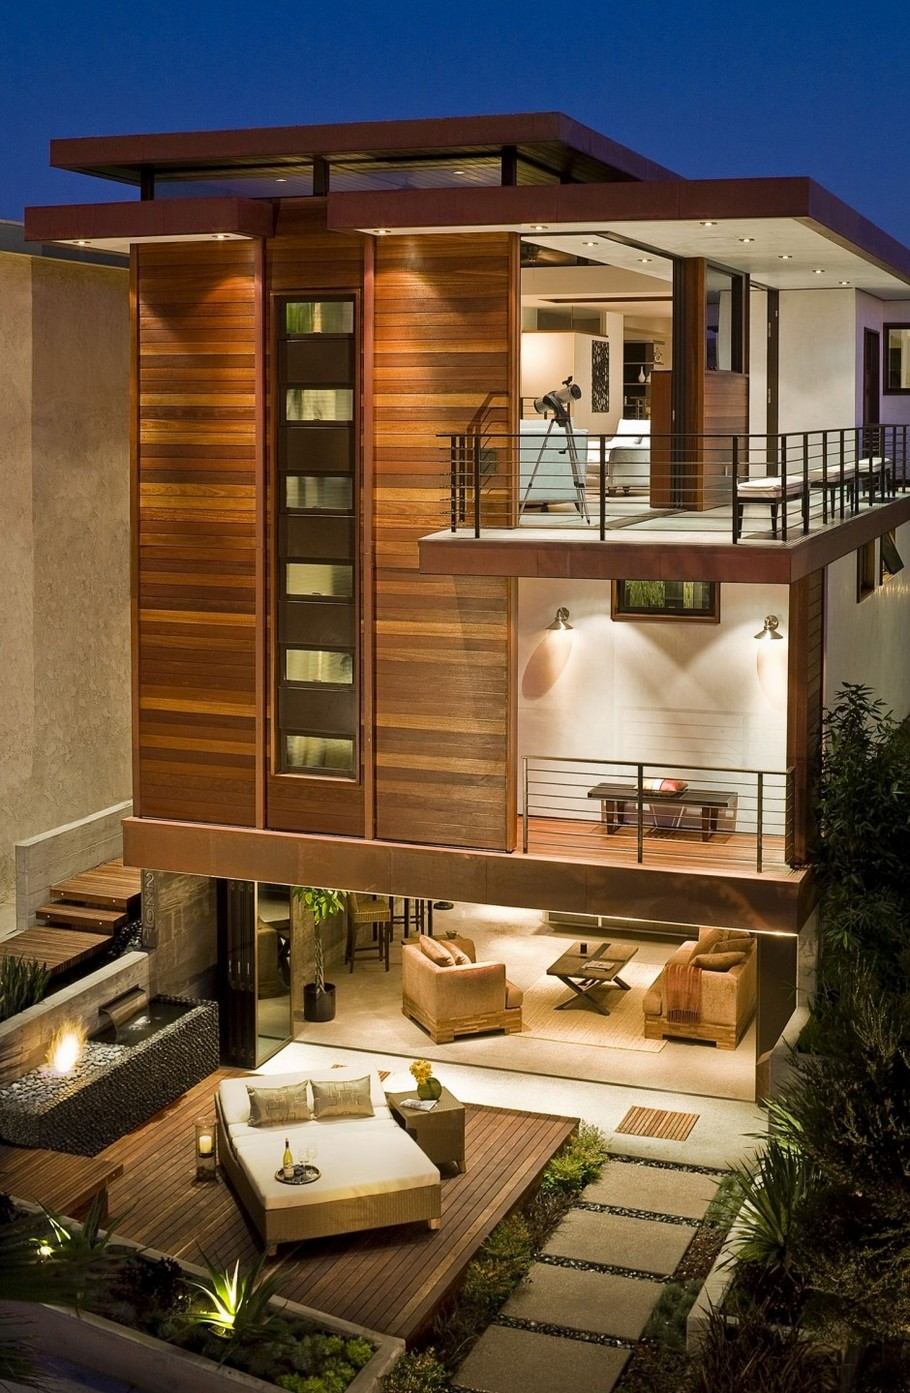 Luxury Home Designs | Home Design Plan